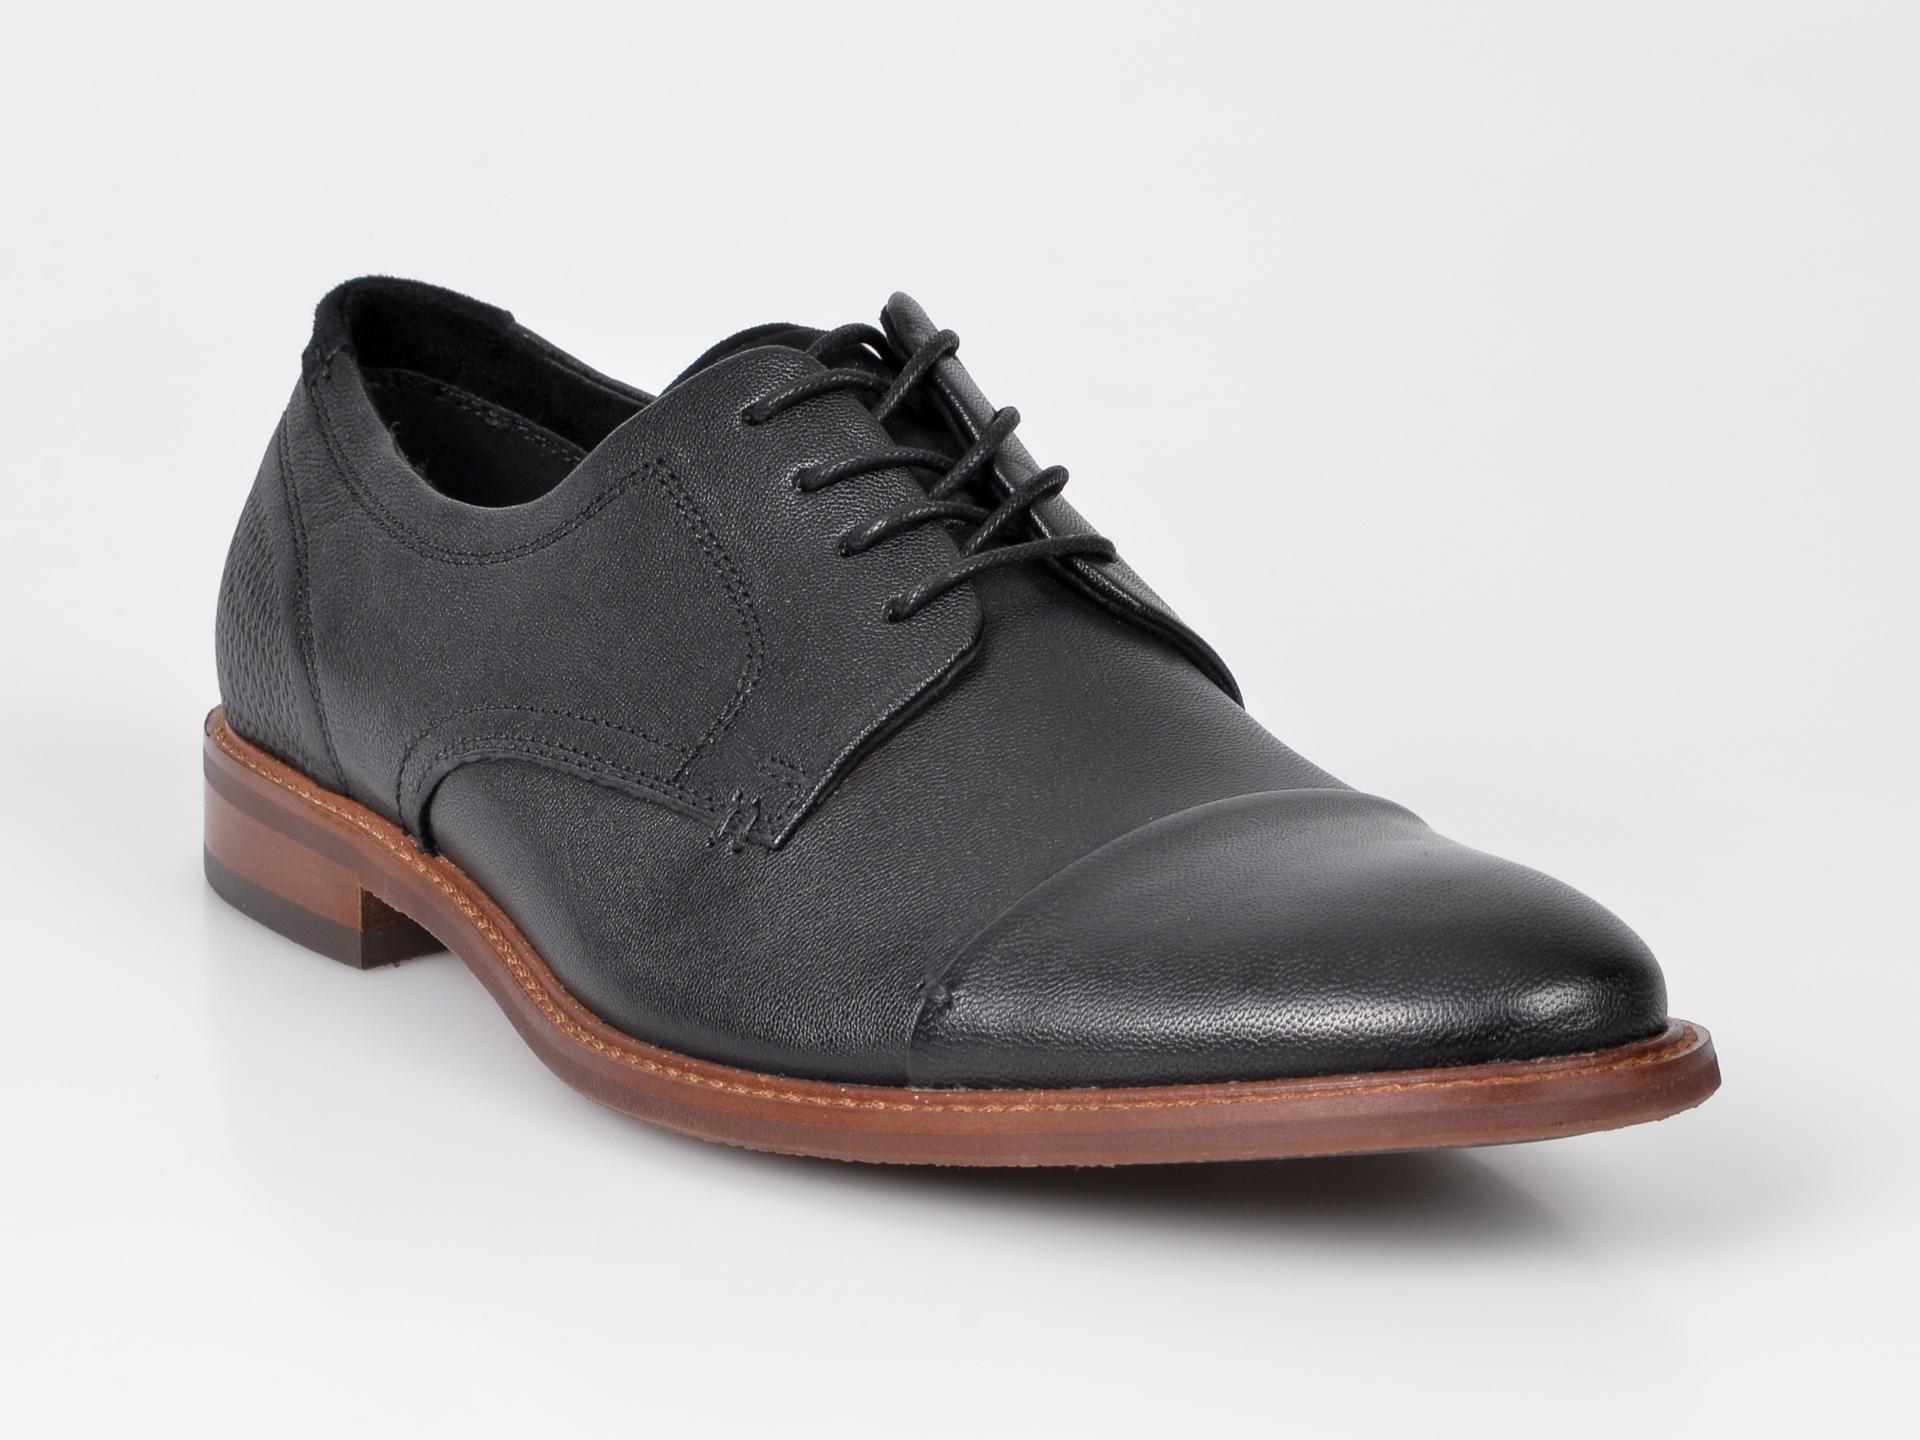 Pantofi ALDO negri, Cradowen, din piele naturala imagine